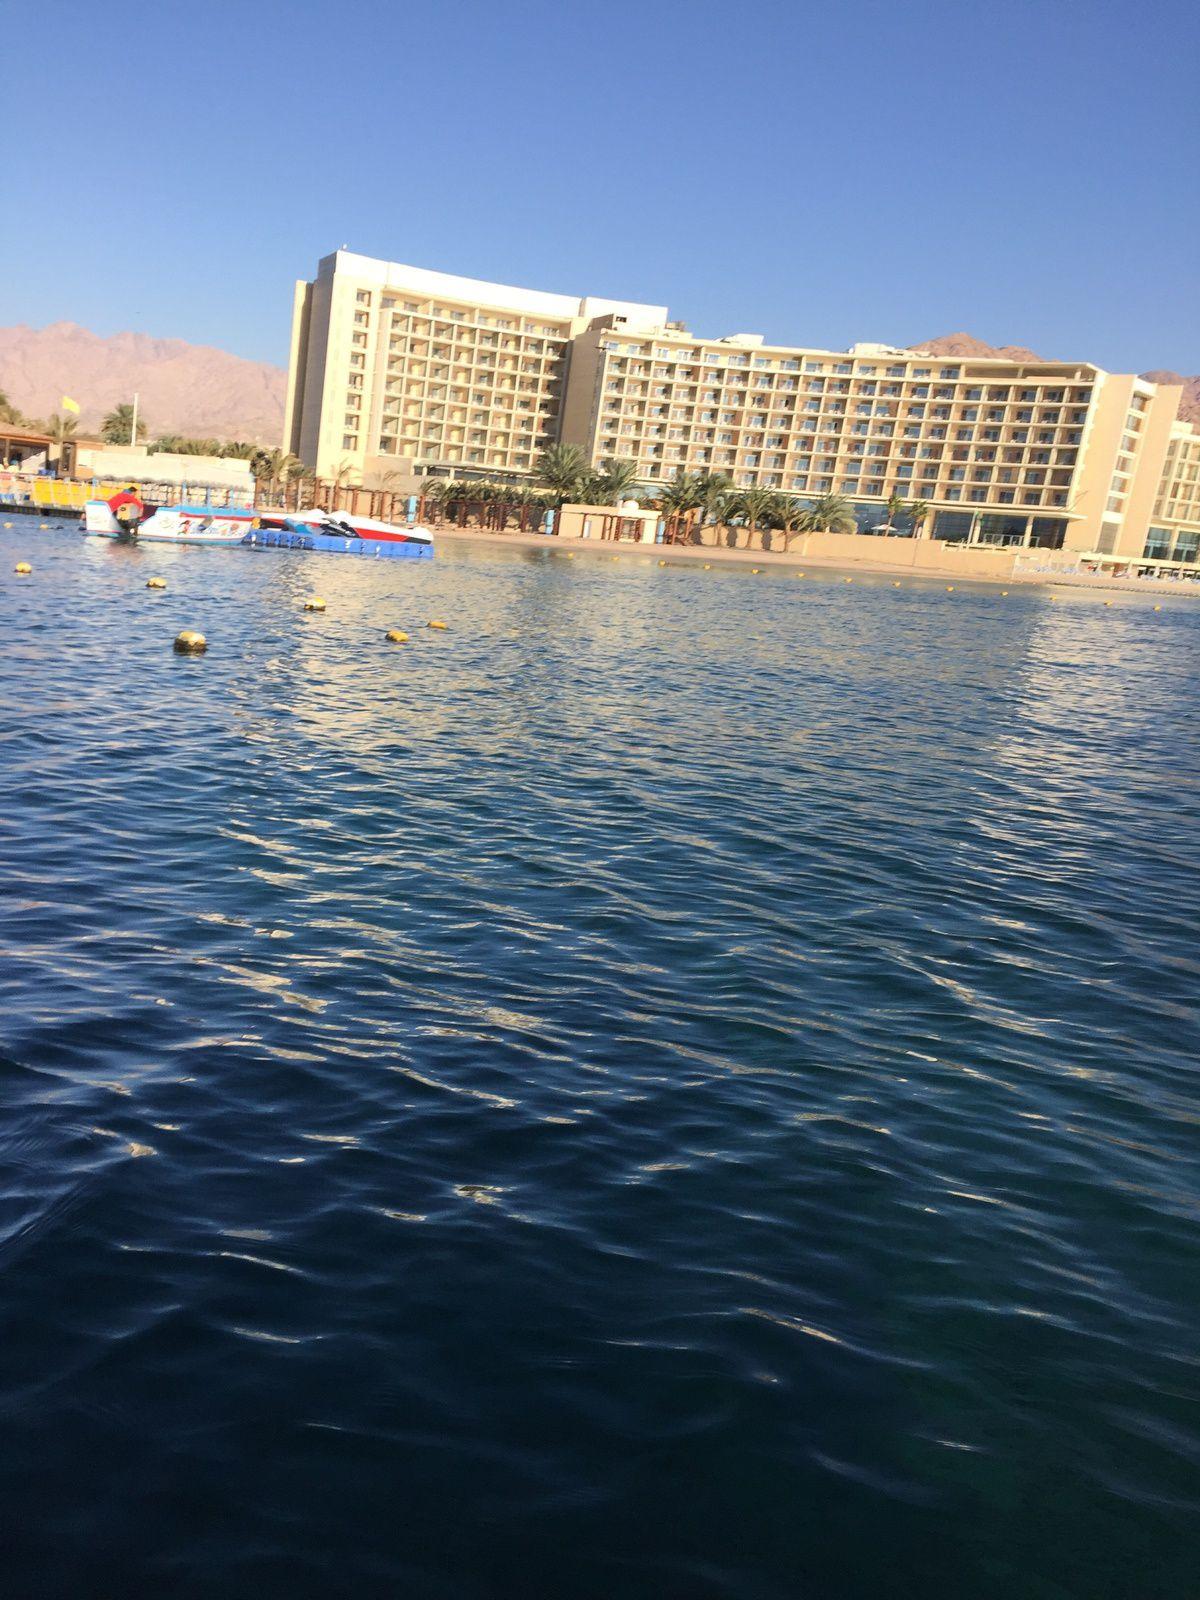 [Aqaba : Excursion à la Mer]